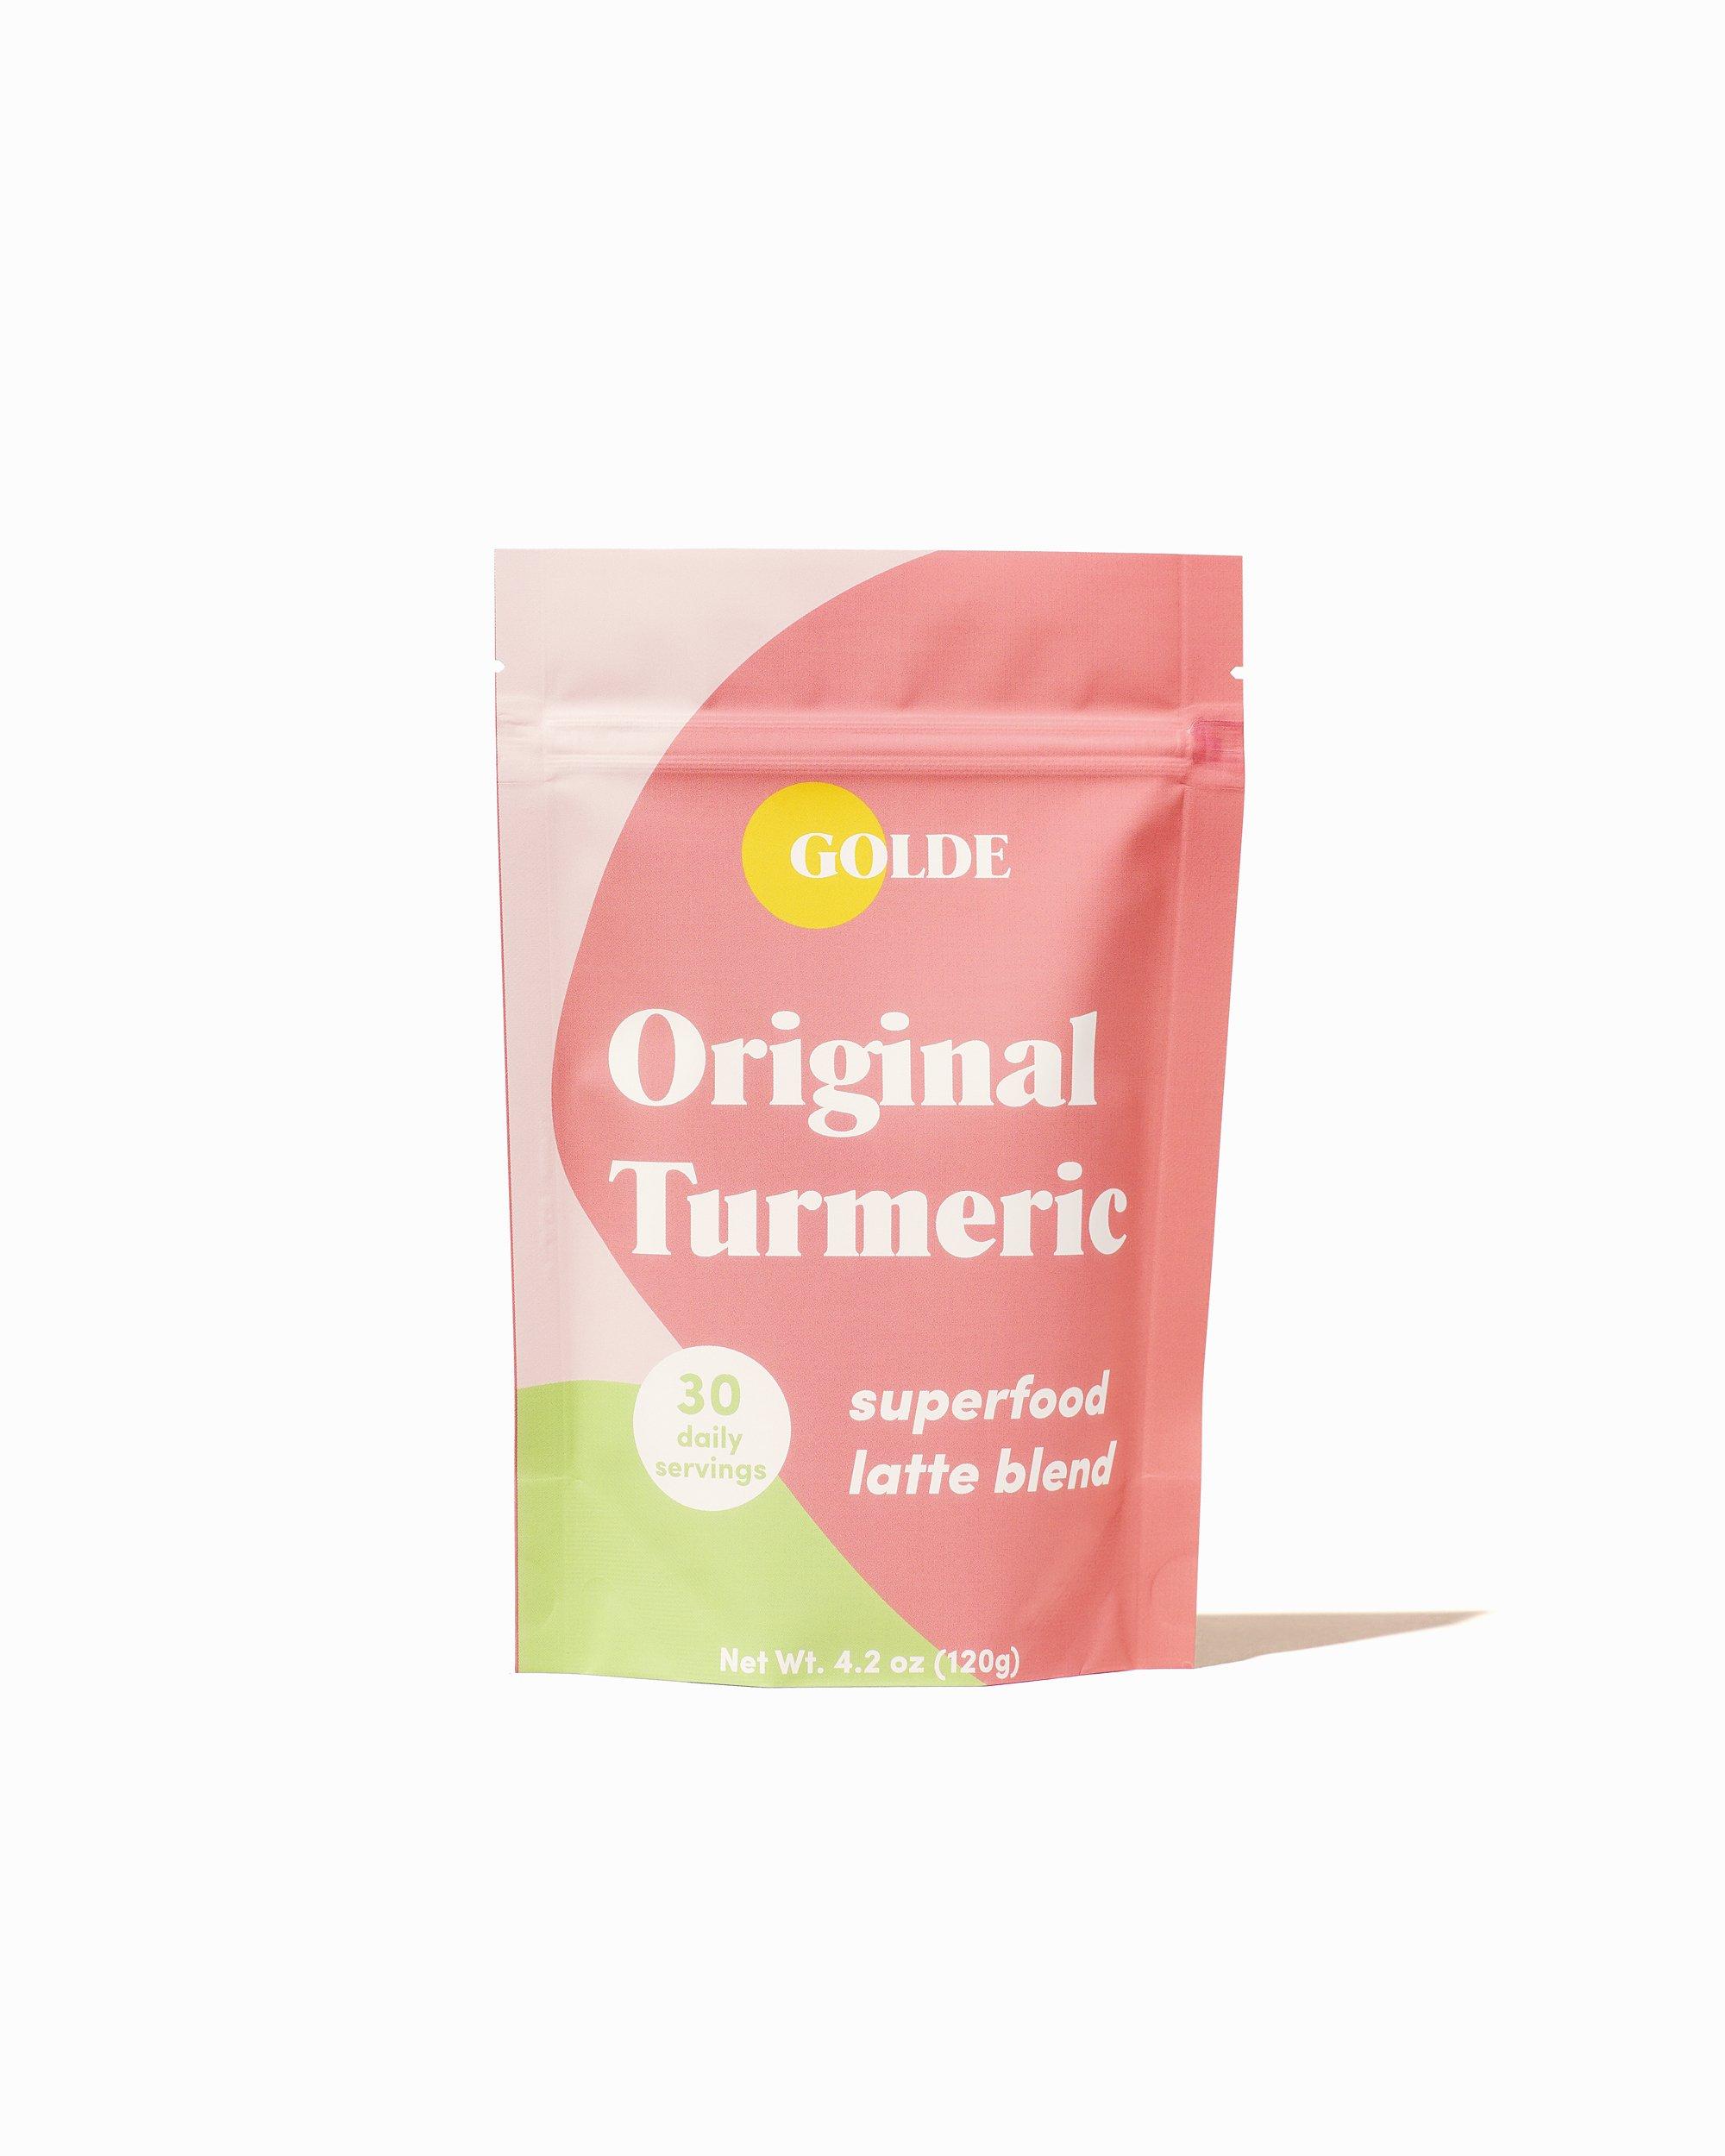 Golde Original Turmeric Latte Blend gimme the good stuff